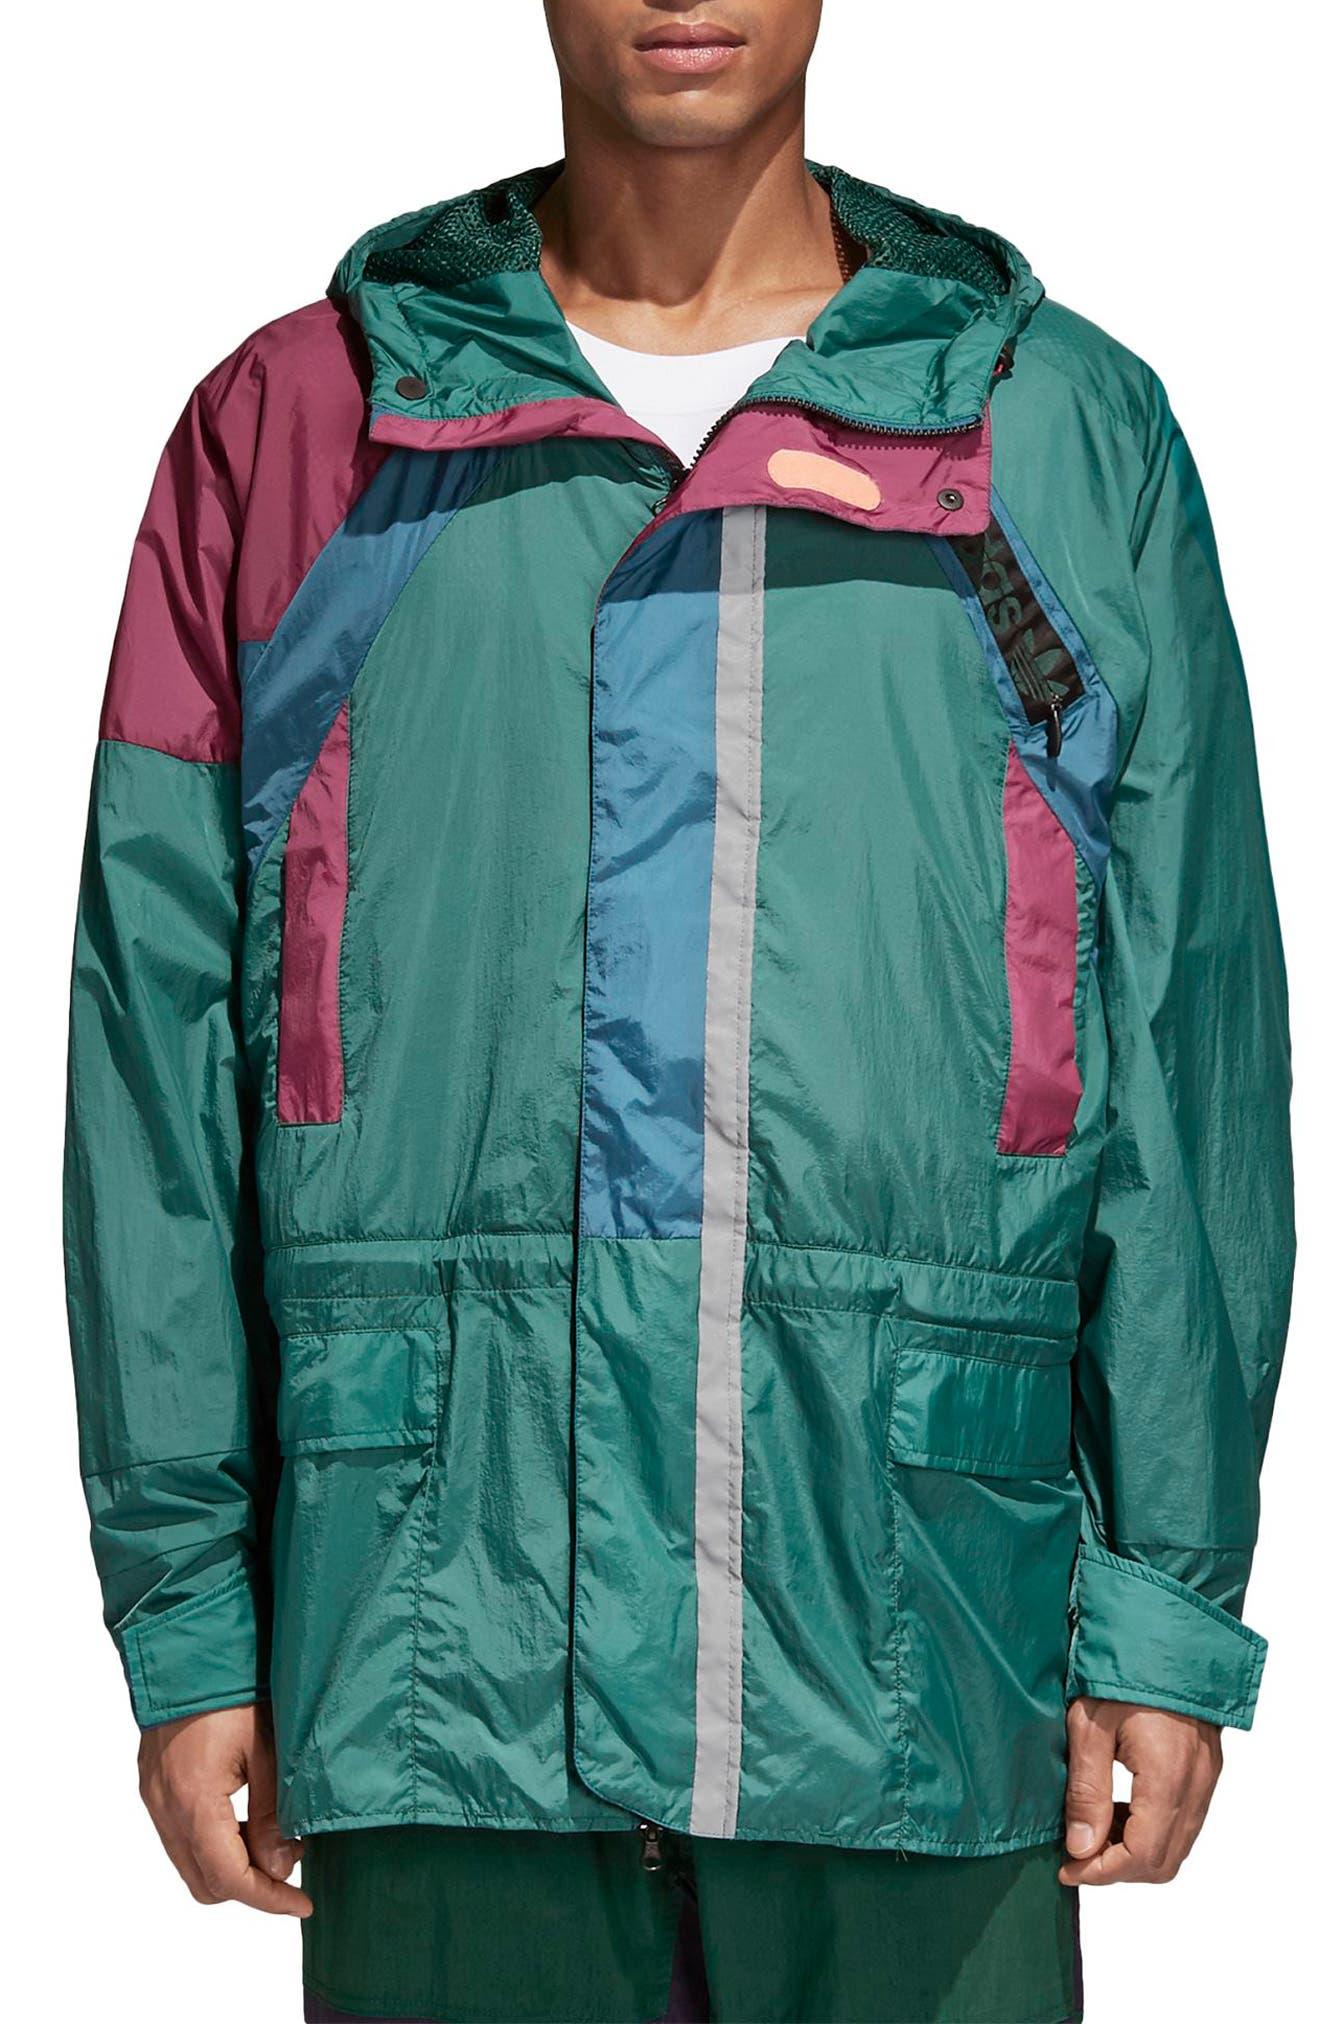 Vintage Jacket,                         Main,                         color, 305